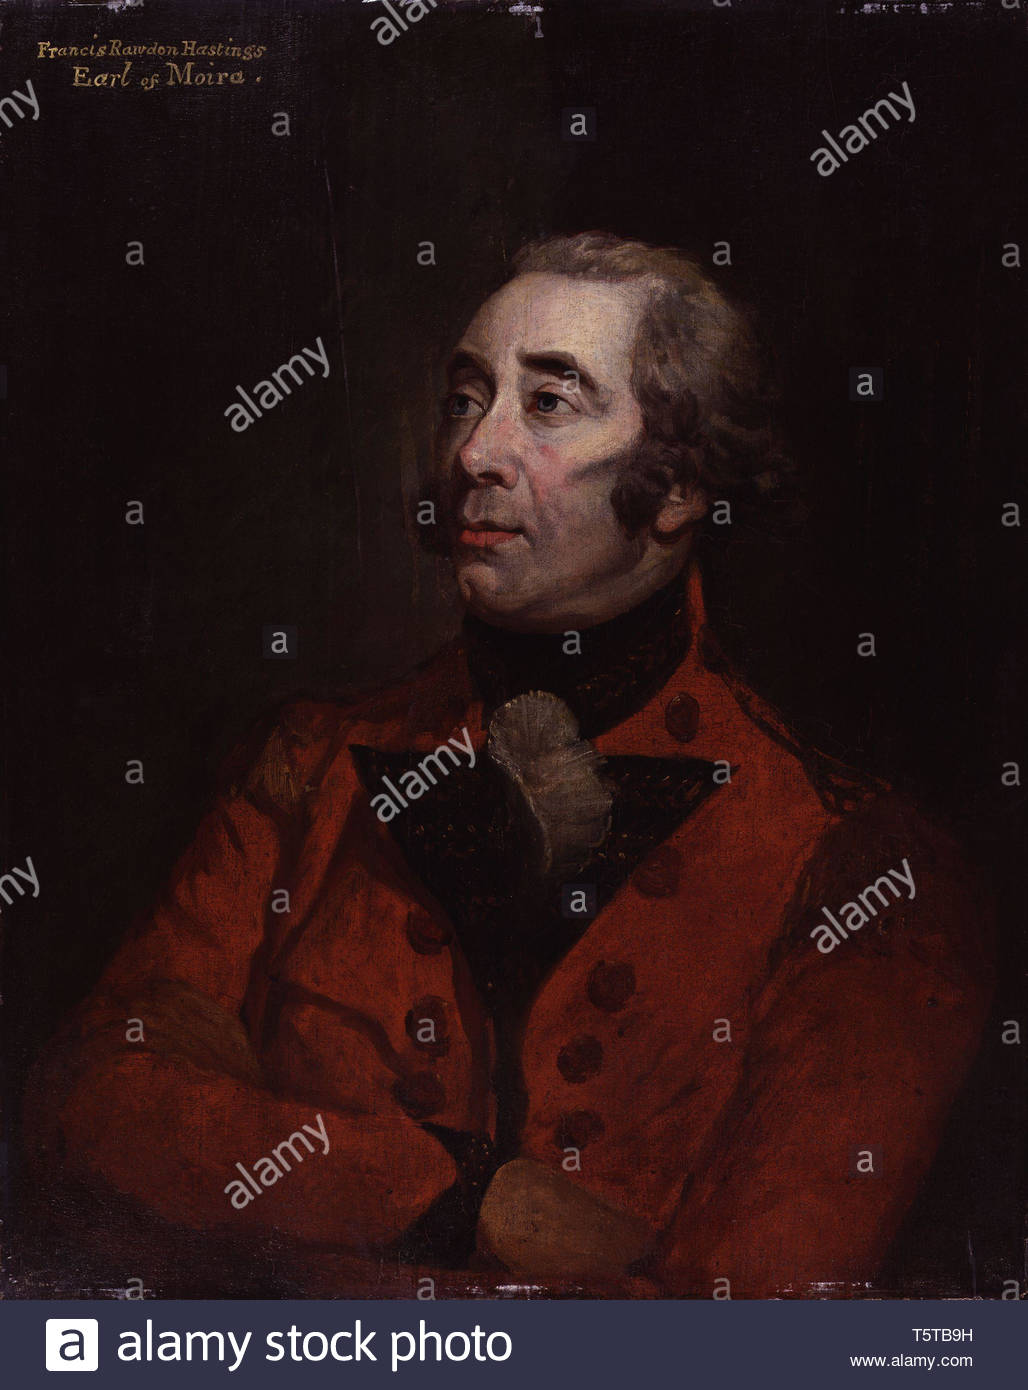 Francis Rawdon-Hastings, 1st Marquess of Hastings - Hugh Douglas Hamilton - Stock Image